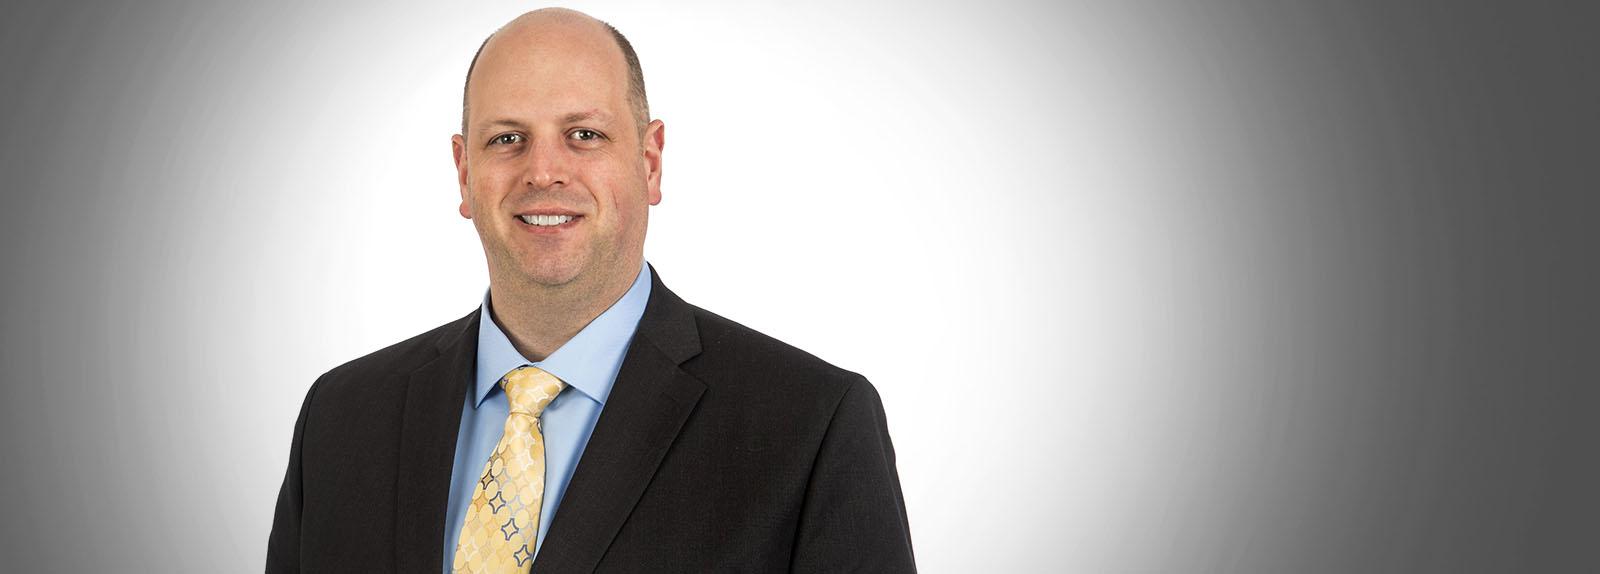 Mark Henderson, MD, radiation oncologist